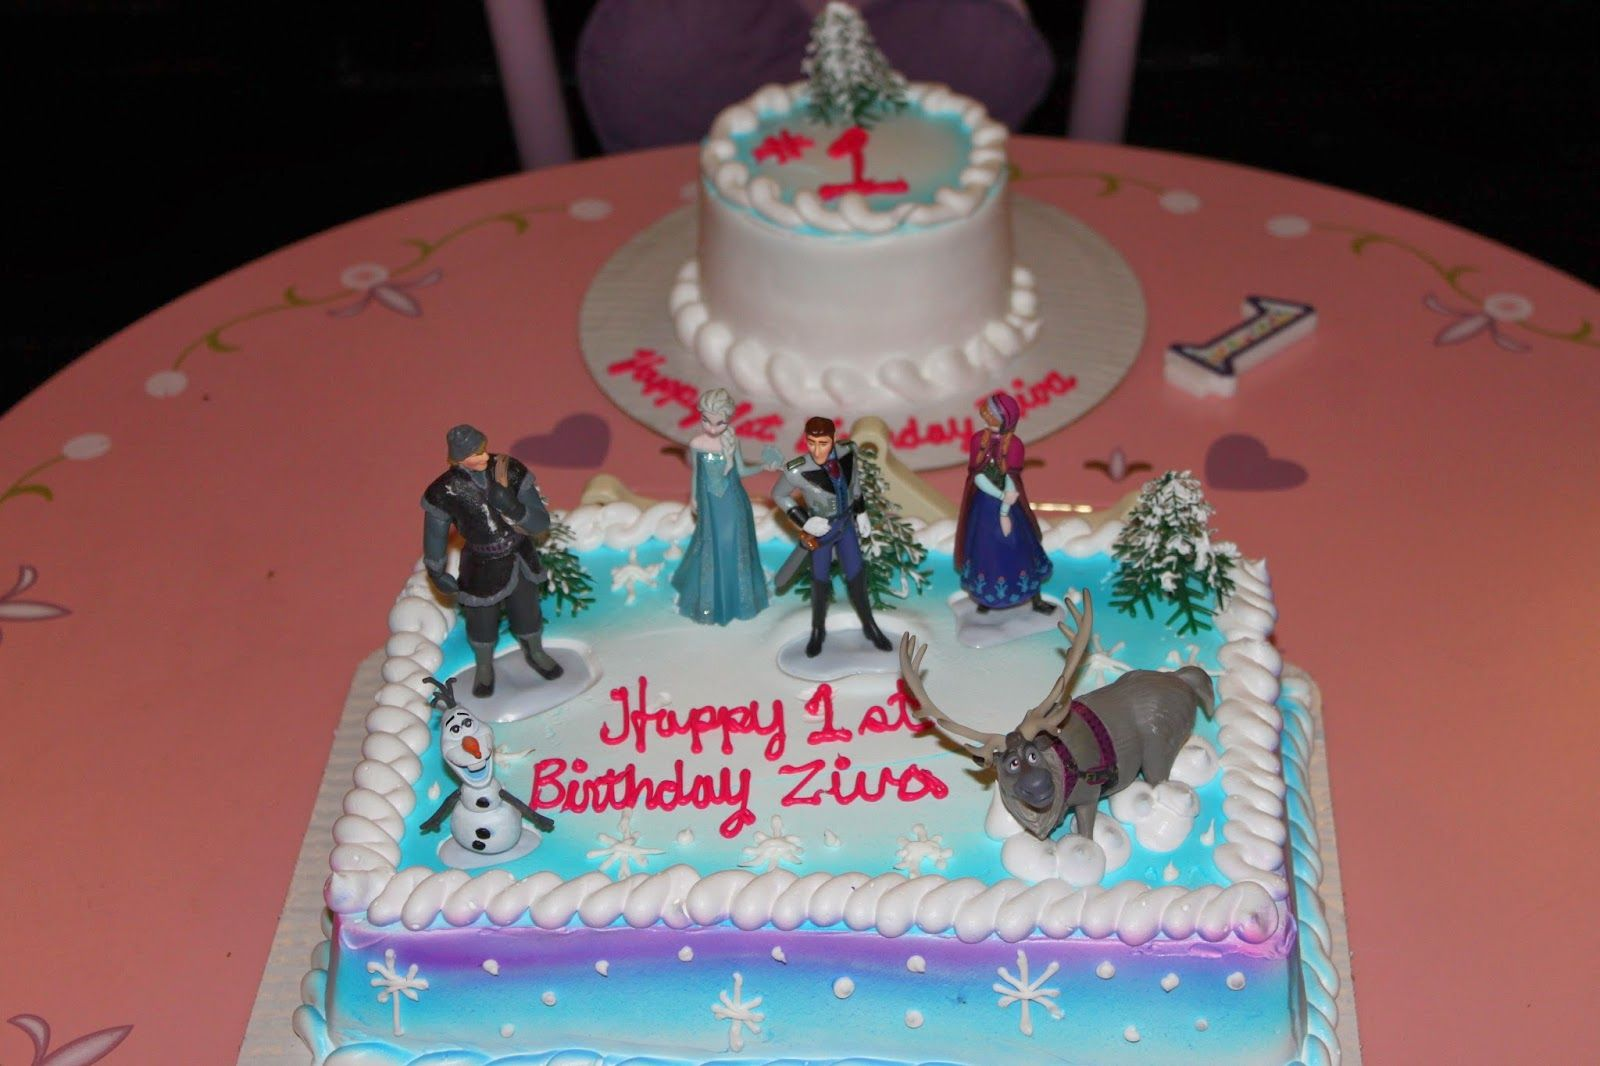 Birthday Cake Ideas Frozen ~ Disney's frozen cake ideas frozen cake ideas frozen party cakes